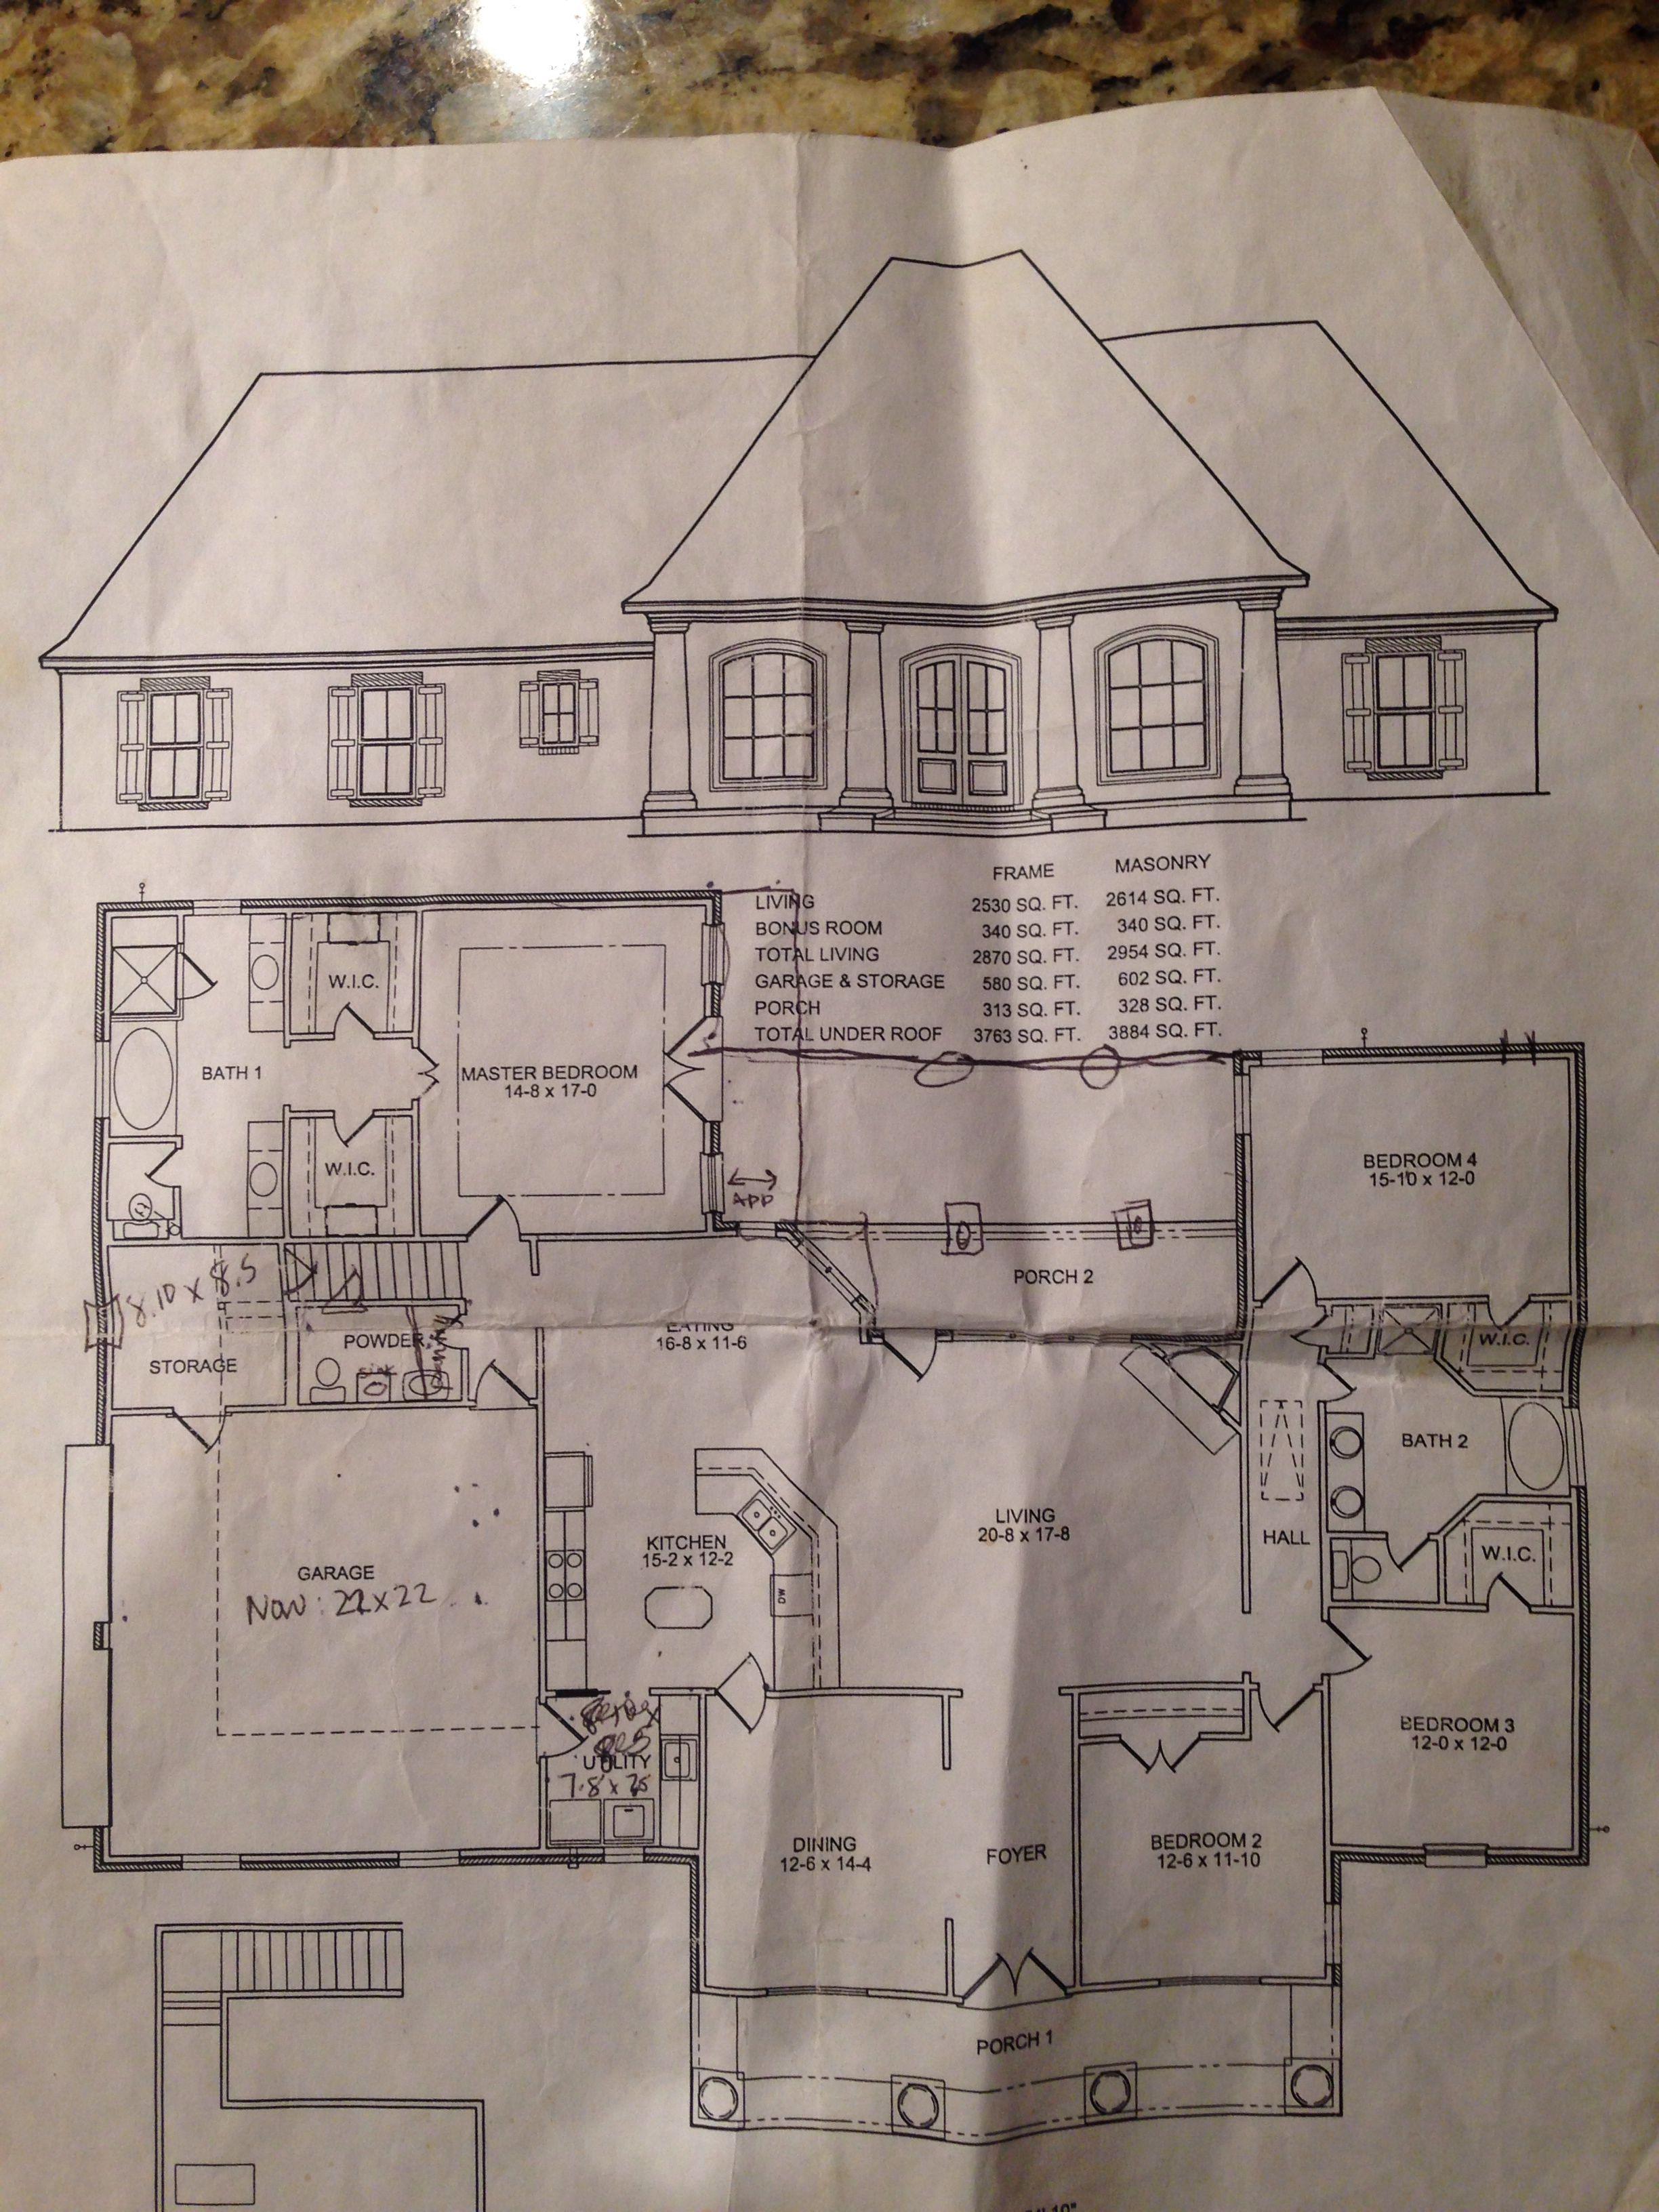 Mandis house plans Mandis house plans